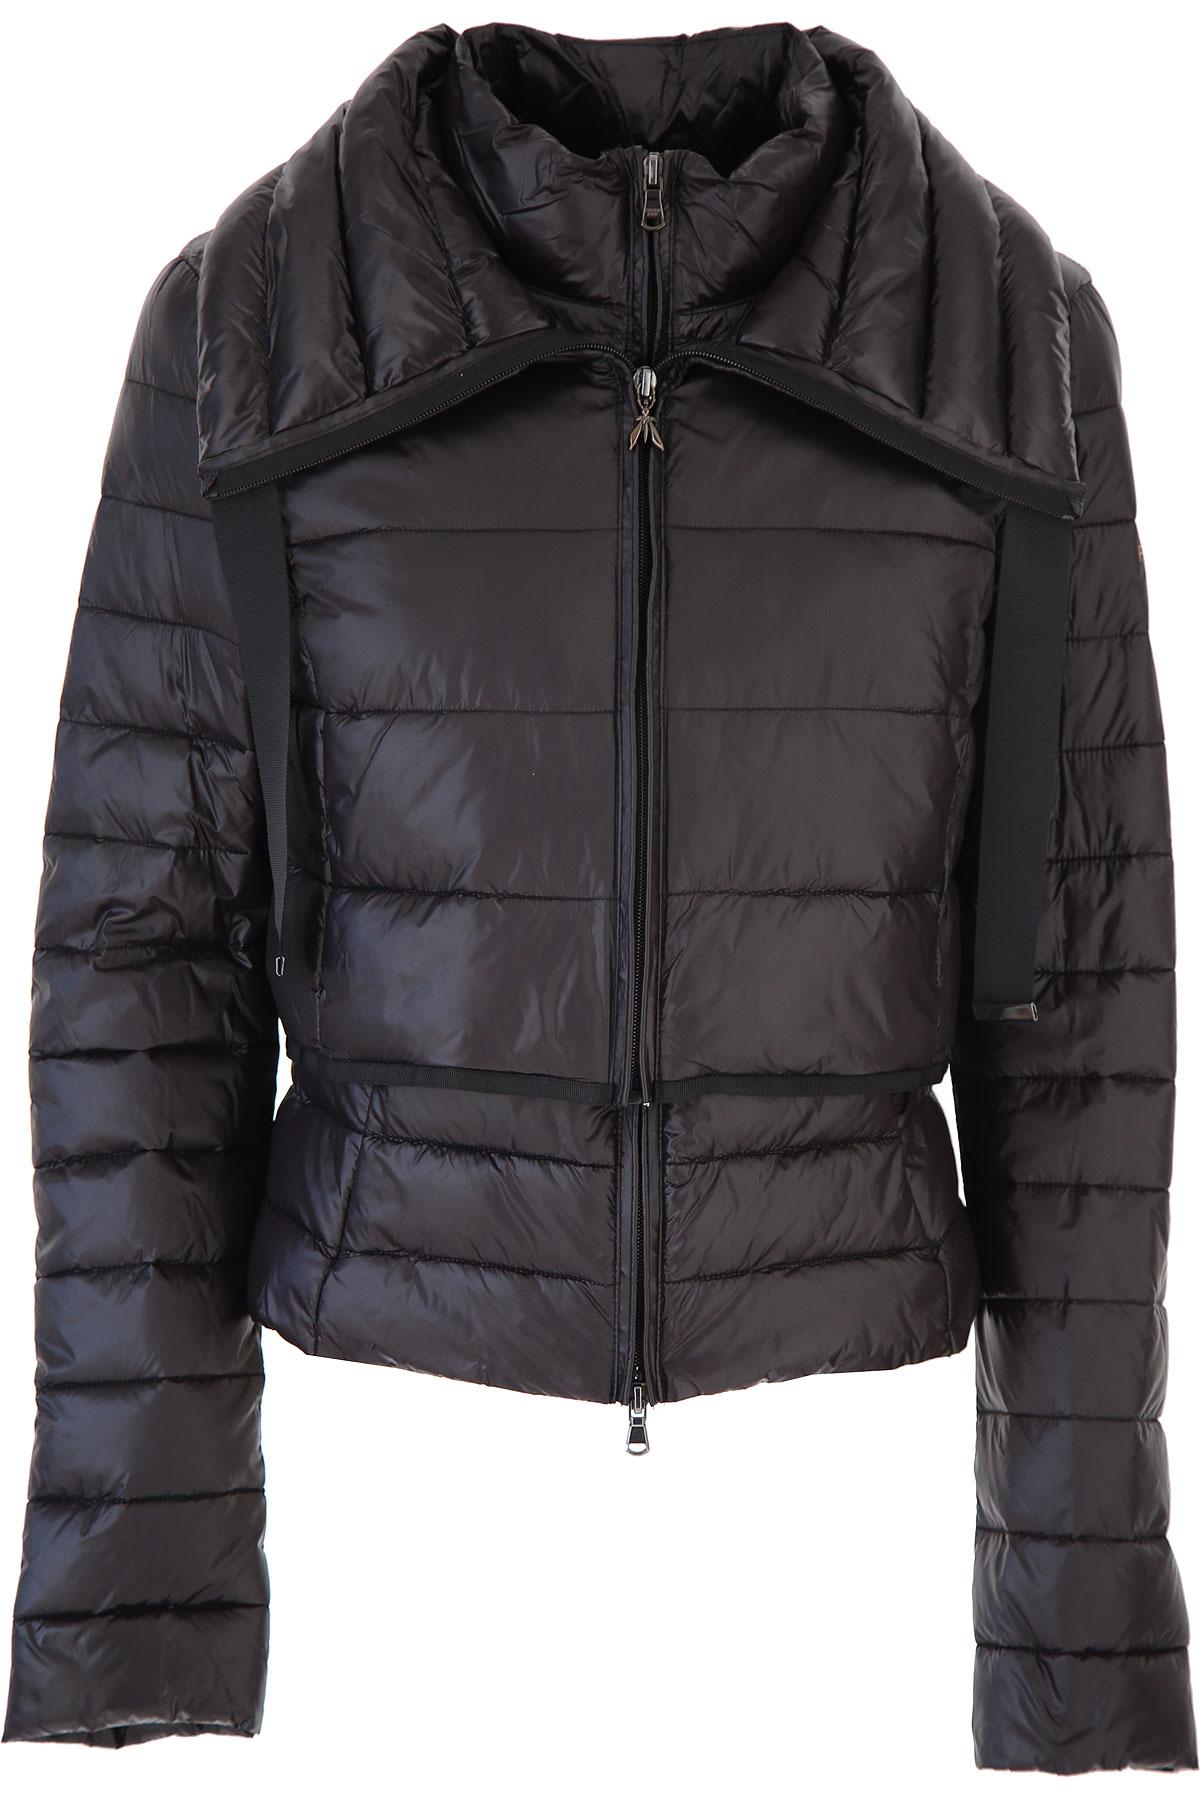 Patrizia Pepe Jacket for Women On Sale, Black, polyamide, 2019, 4 6